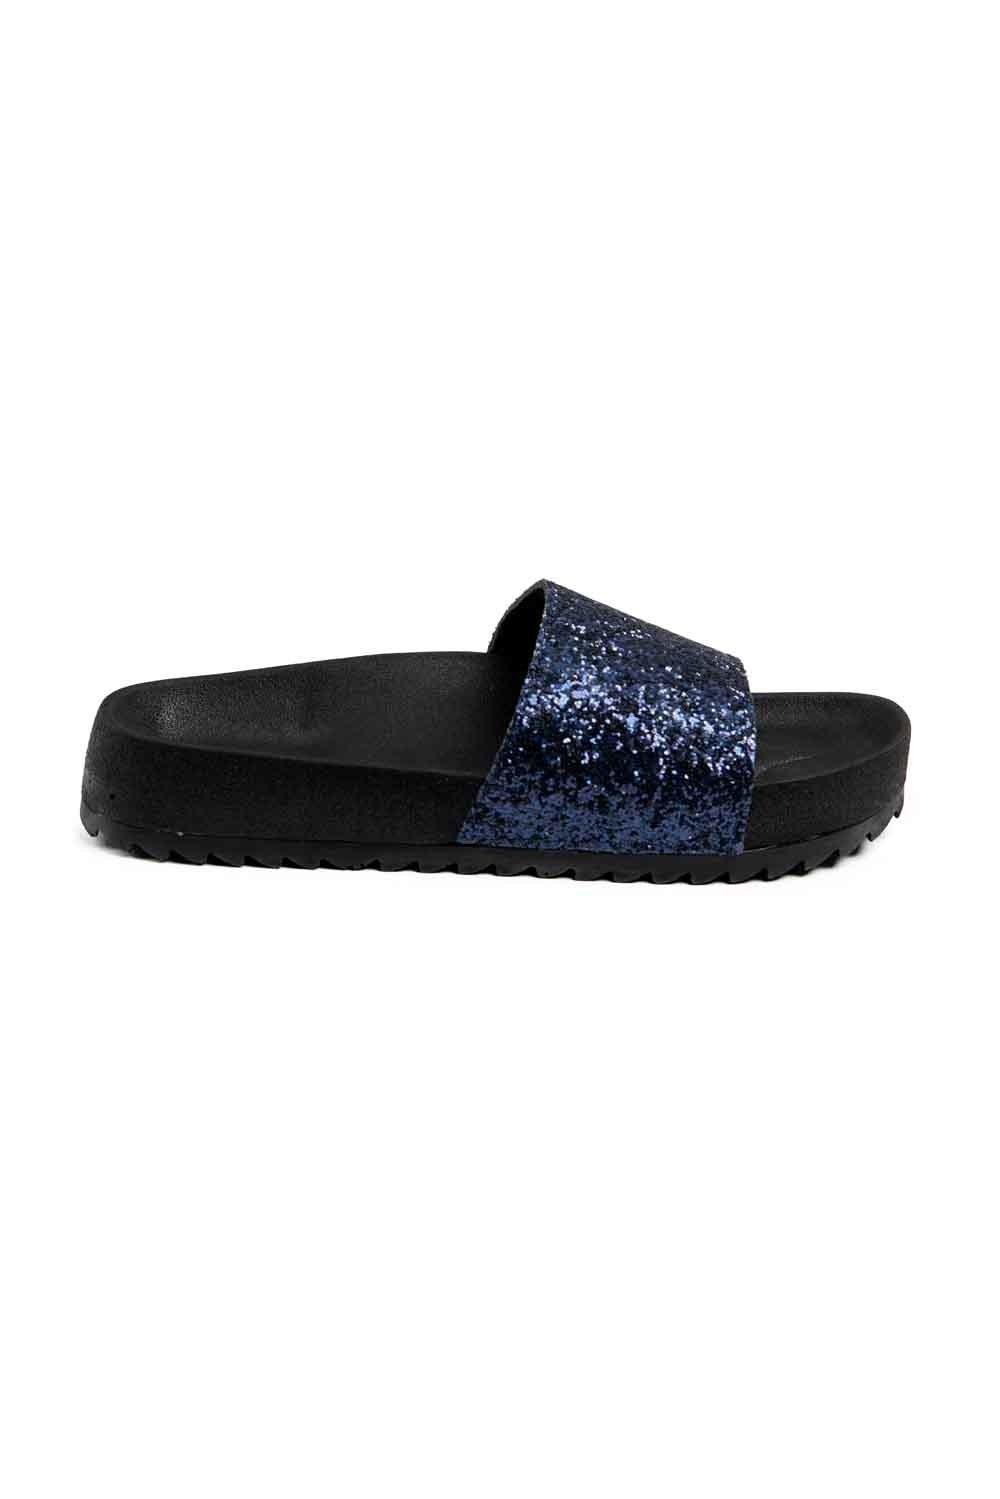 MIZALLE Soft Sole Slippers (Navy Blue Sequins) (1)